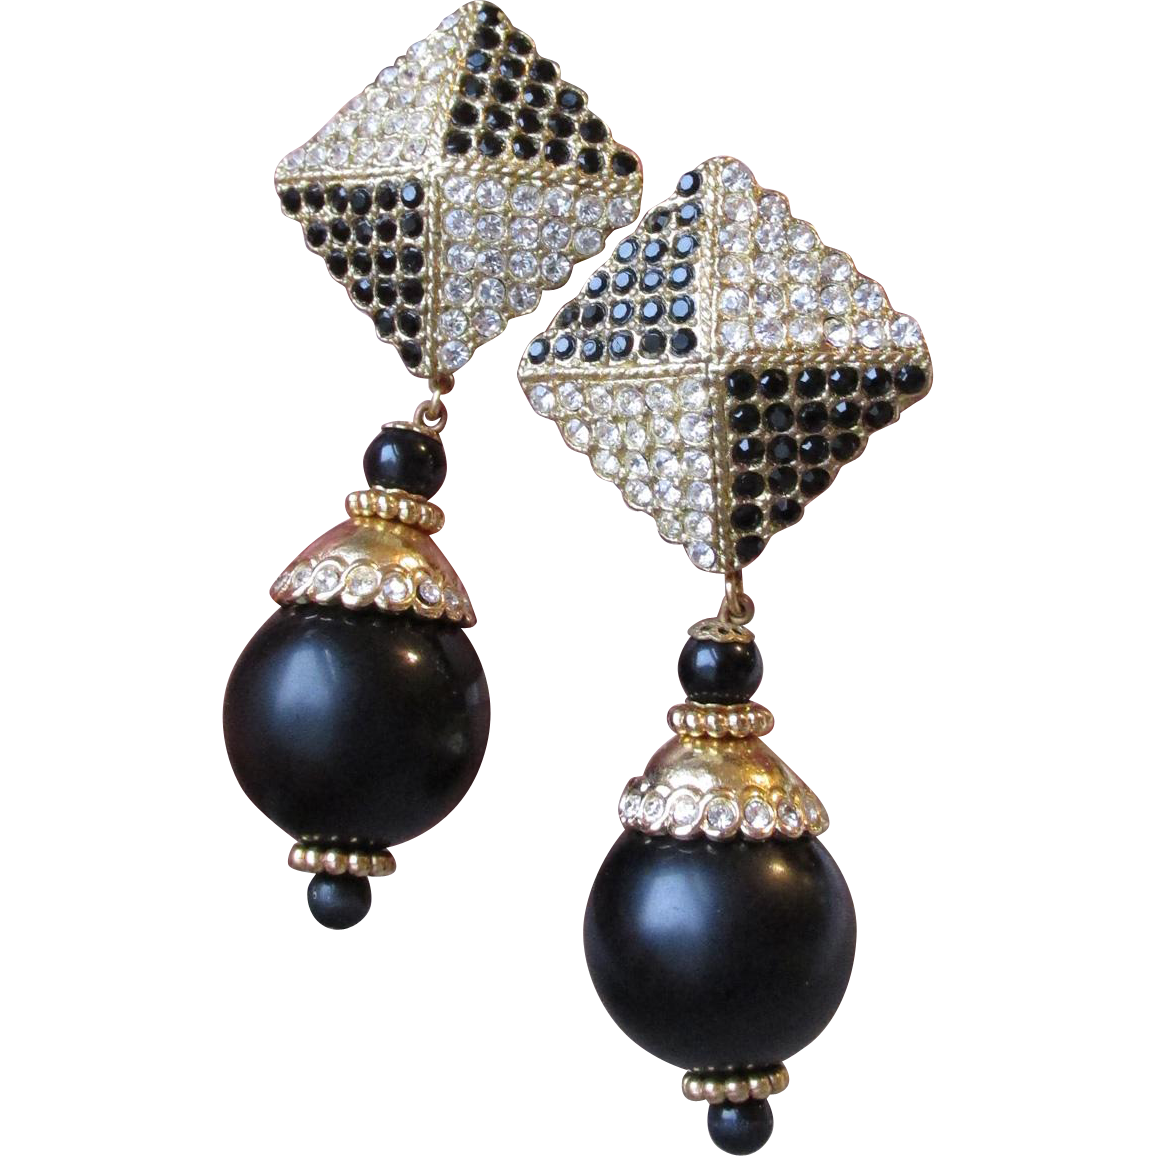 MASSIVE 1980's Vintage Black & Gold Rhinestone Dangle Ball Earrings, Signed Equivogue